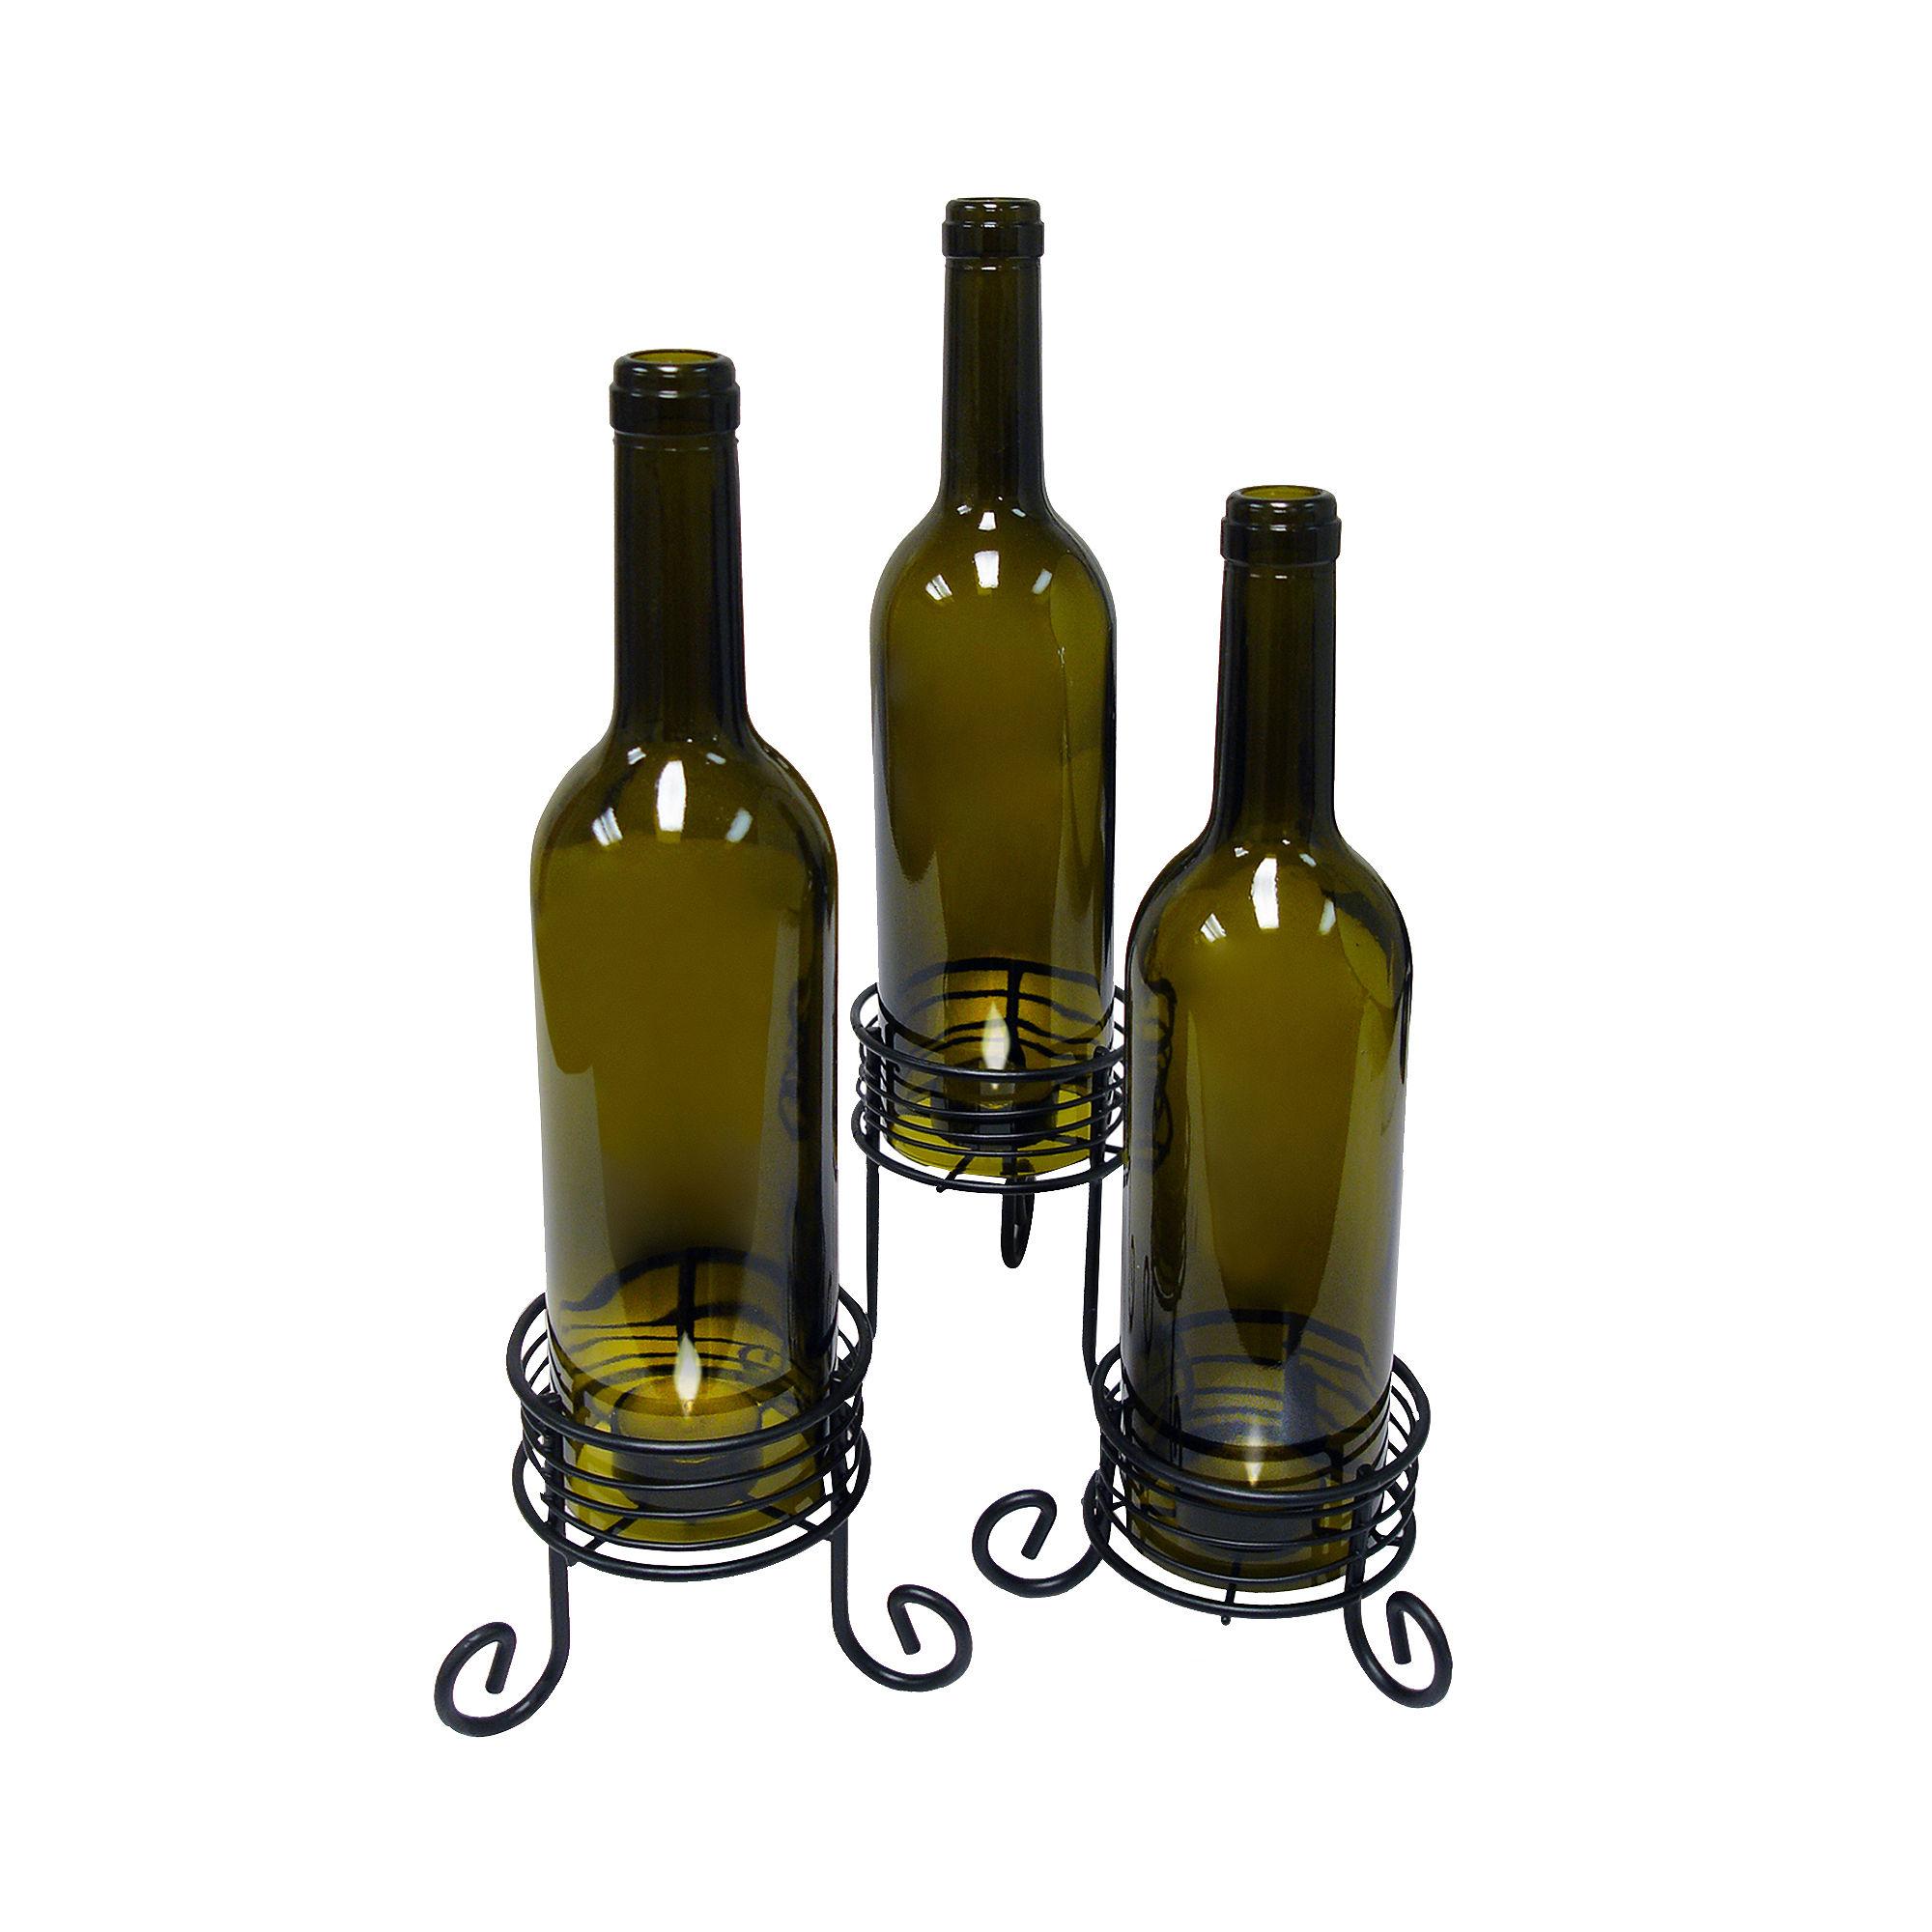 Epicureanist™ Set of 3 Wine Bottle Tealight Candle Holders